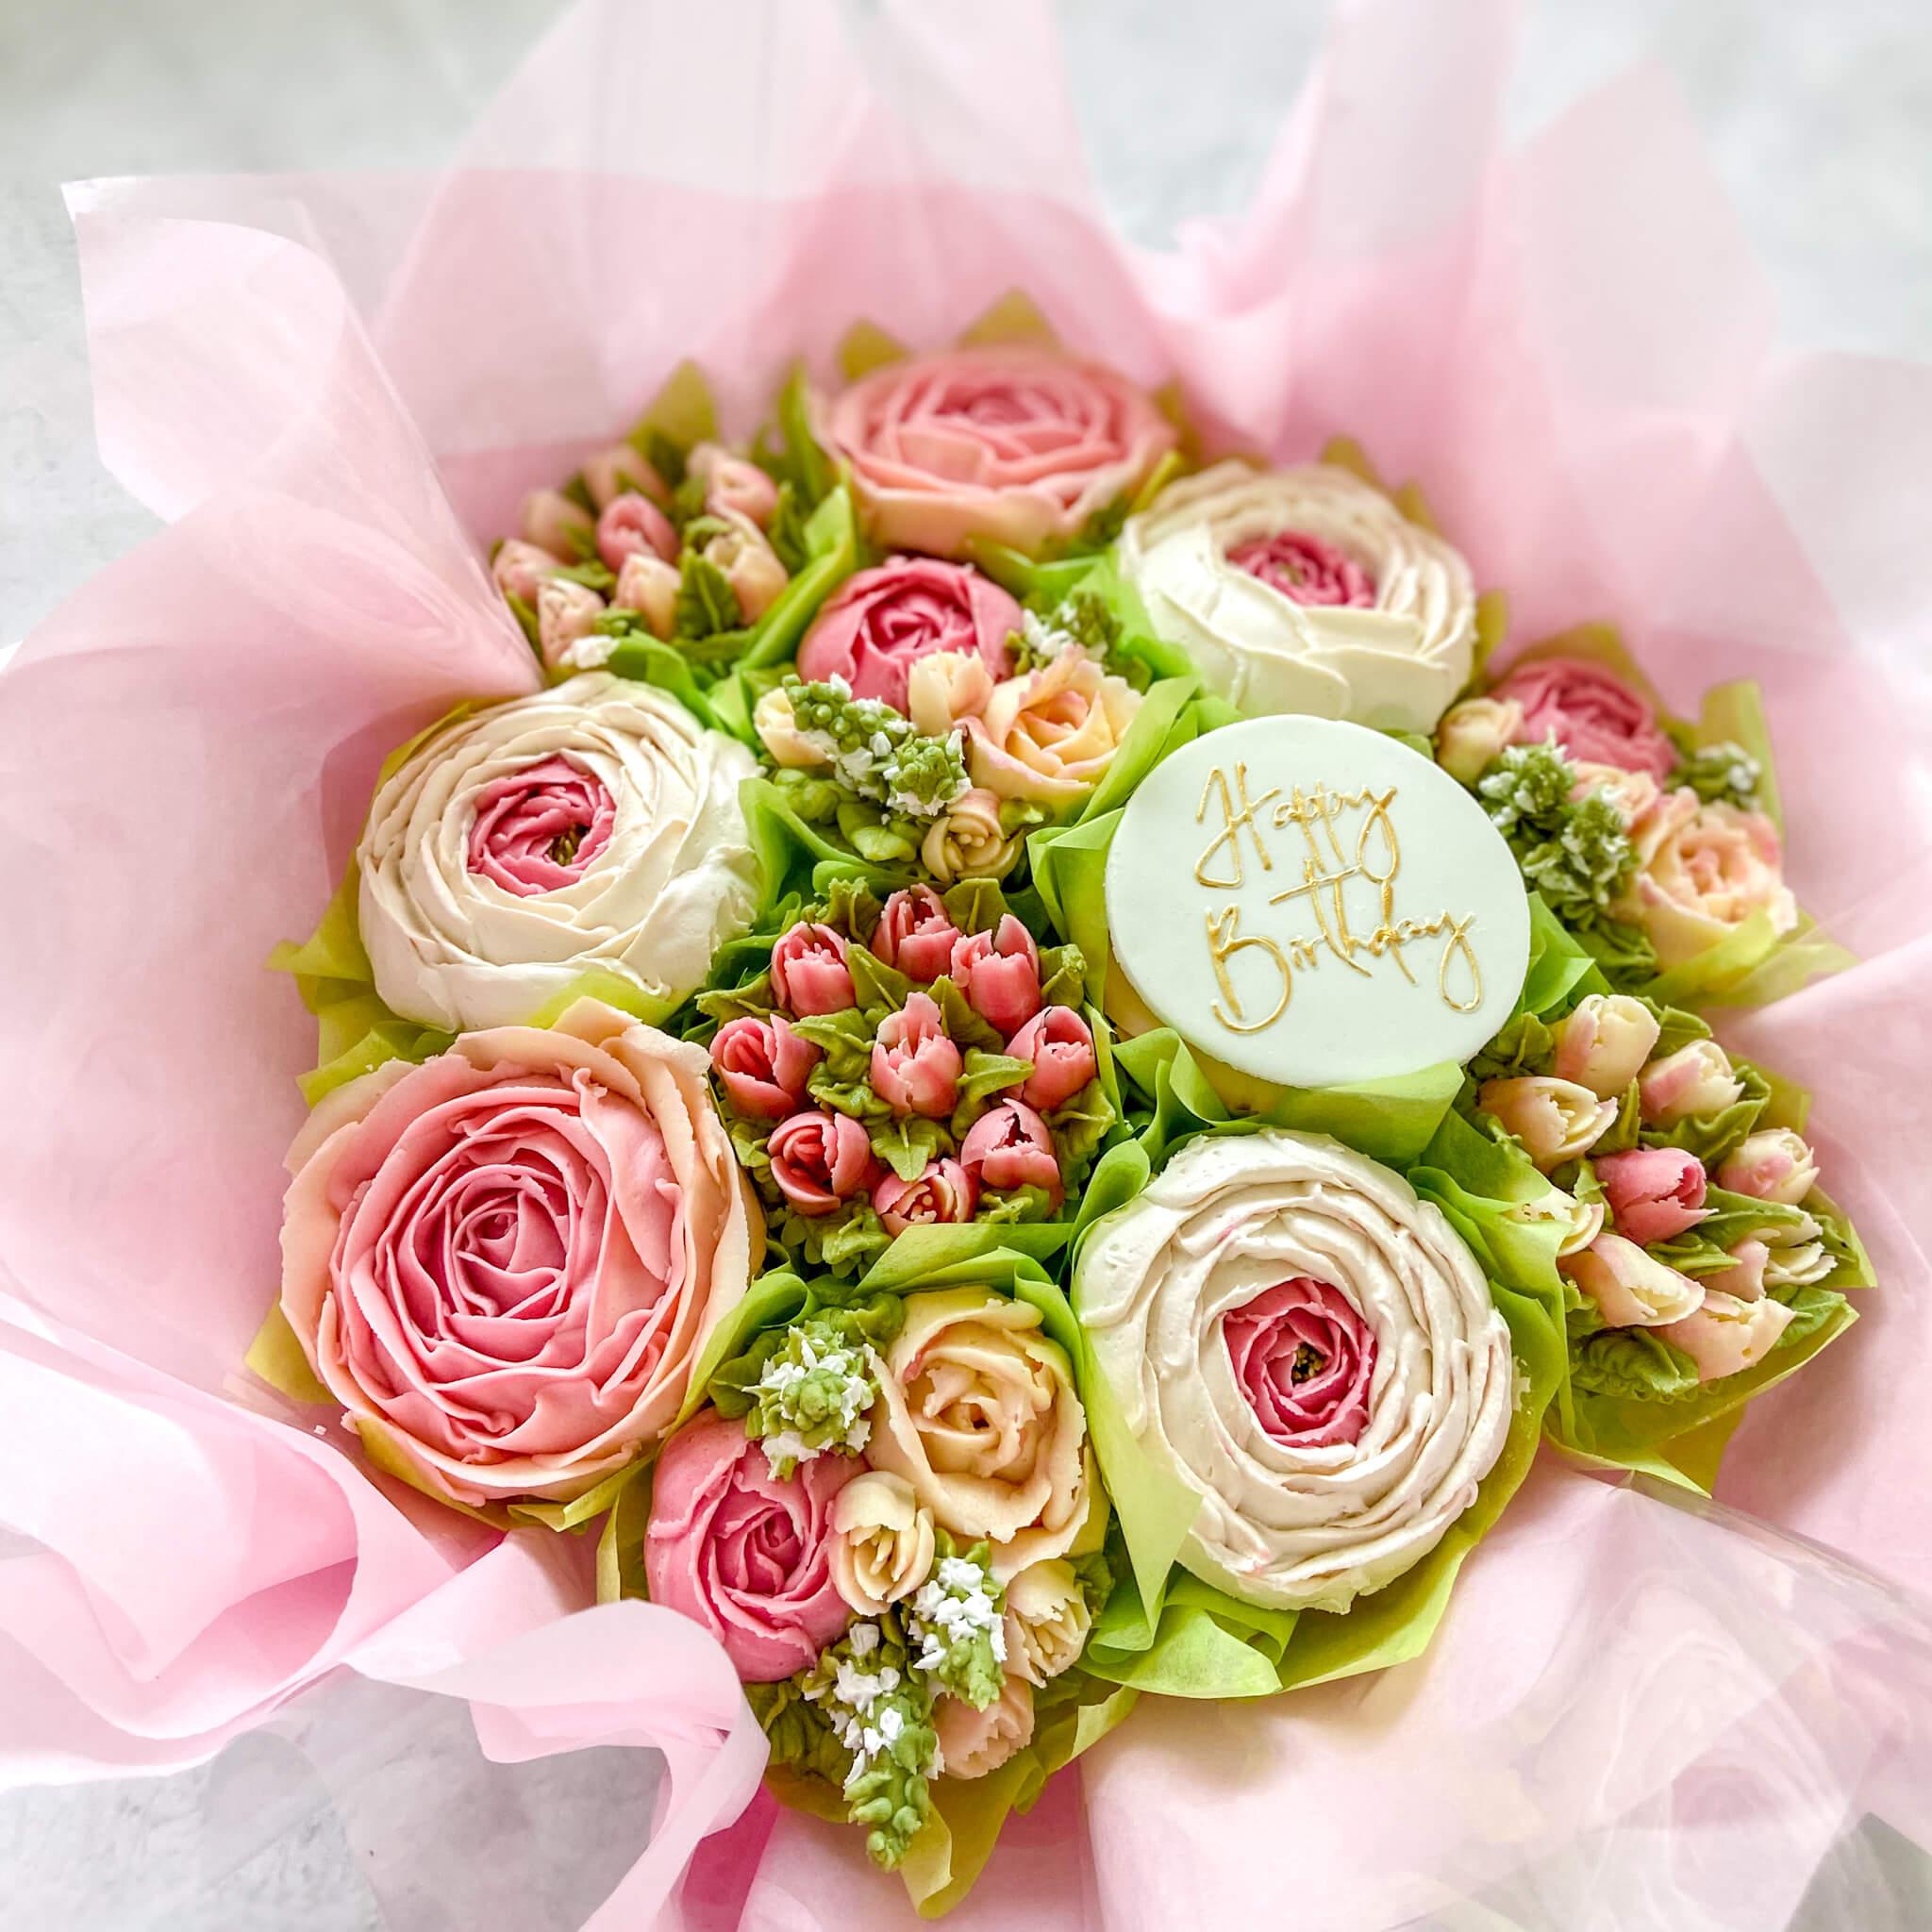 12 soft pinks